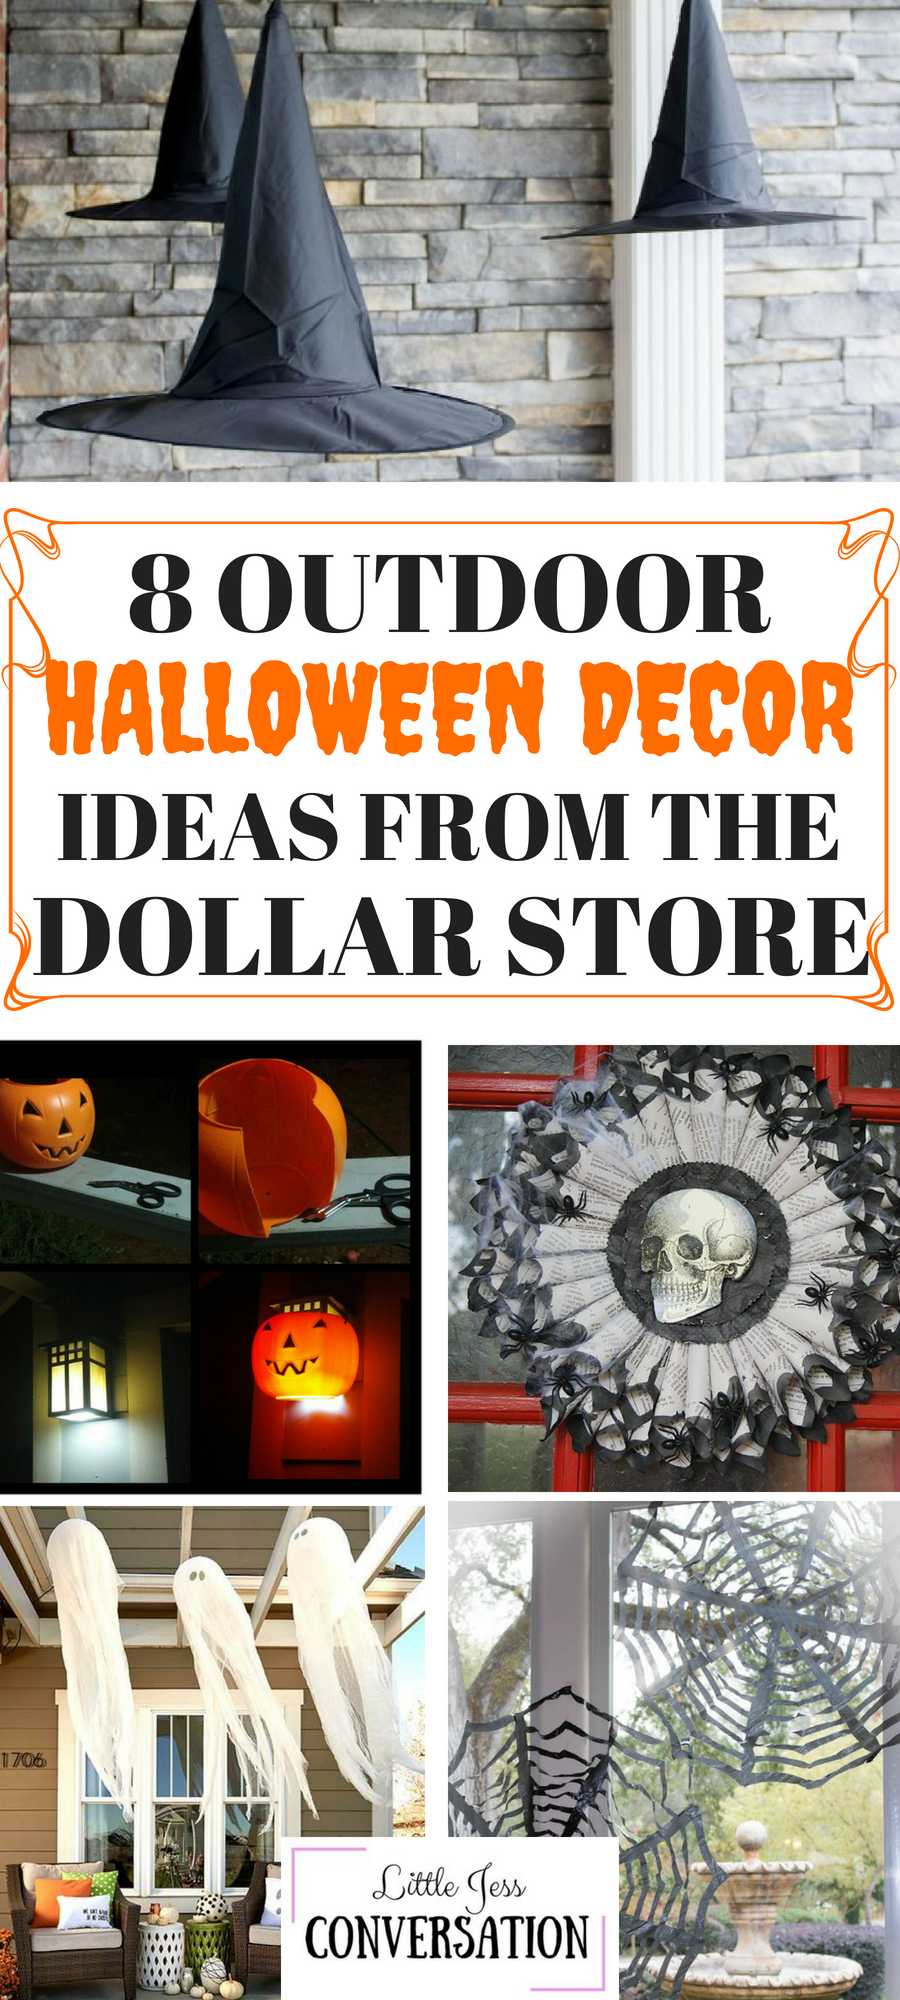 8 Outdoor Halloween Decor Ideas From The Dollar Store Holiday Halloween Outdoor Decorations Dollar Store Halloween Decorations Outdoor Halloween